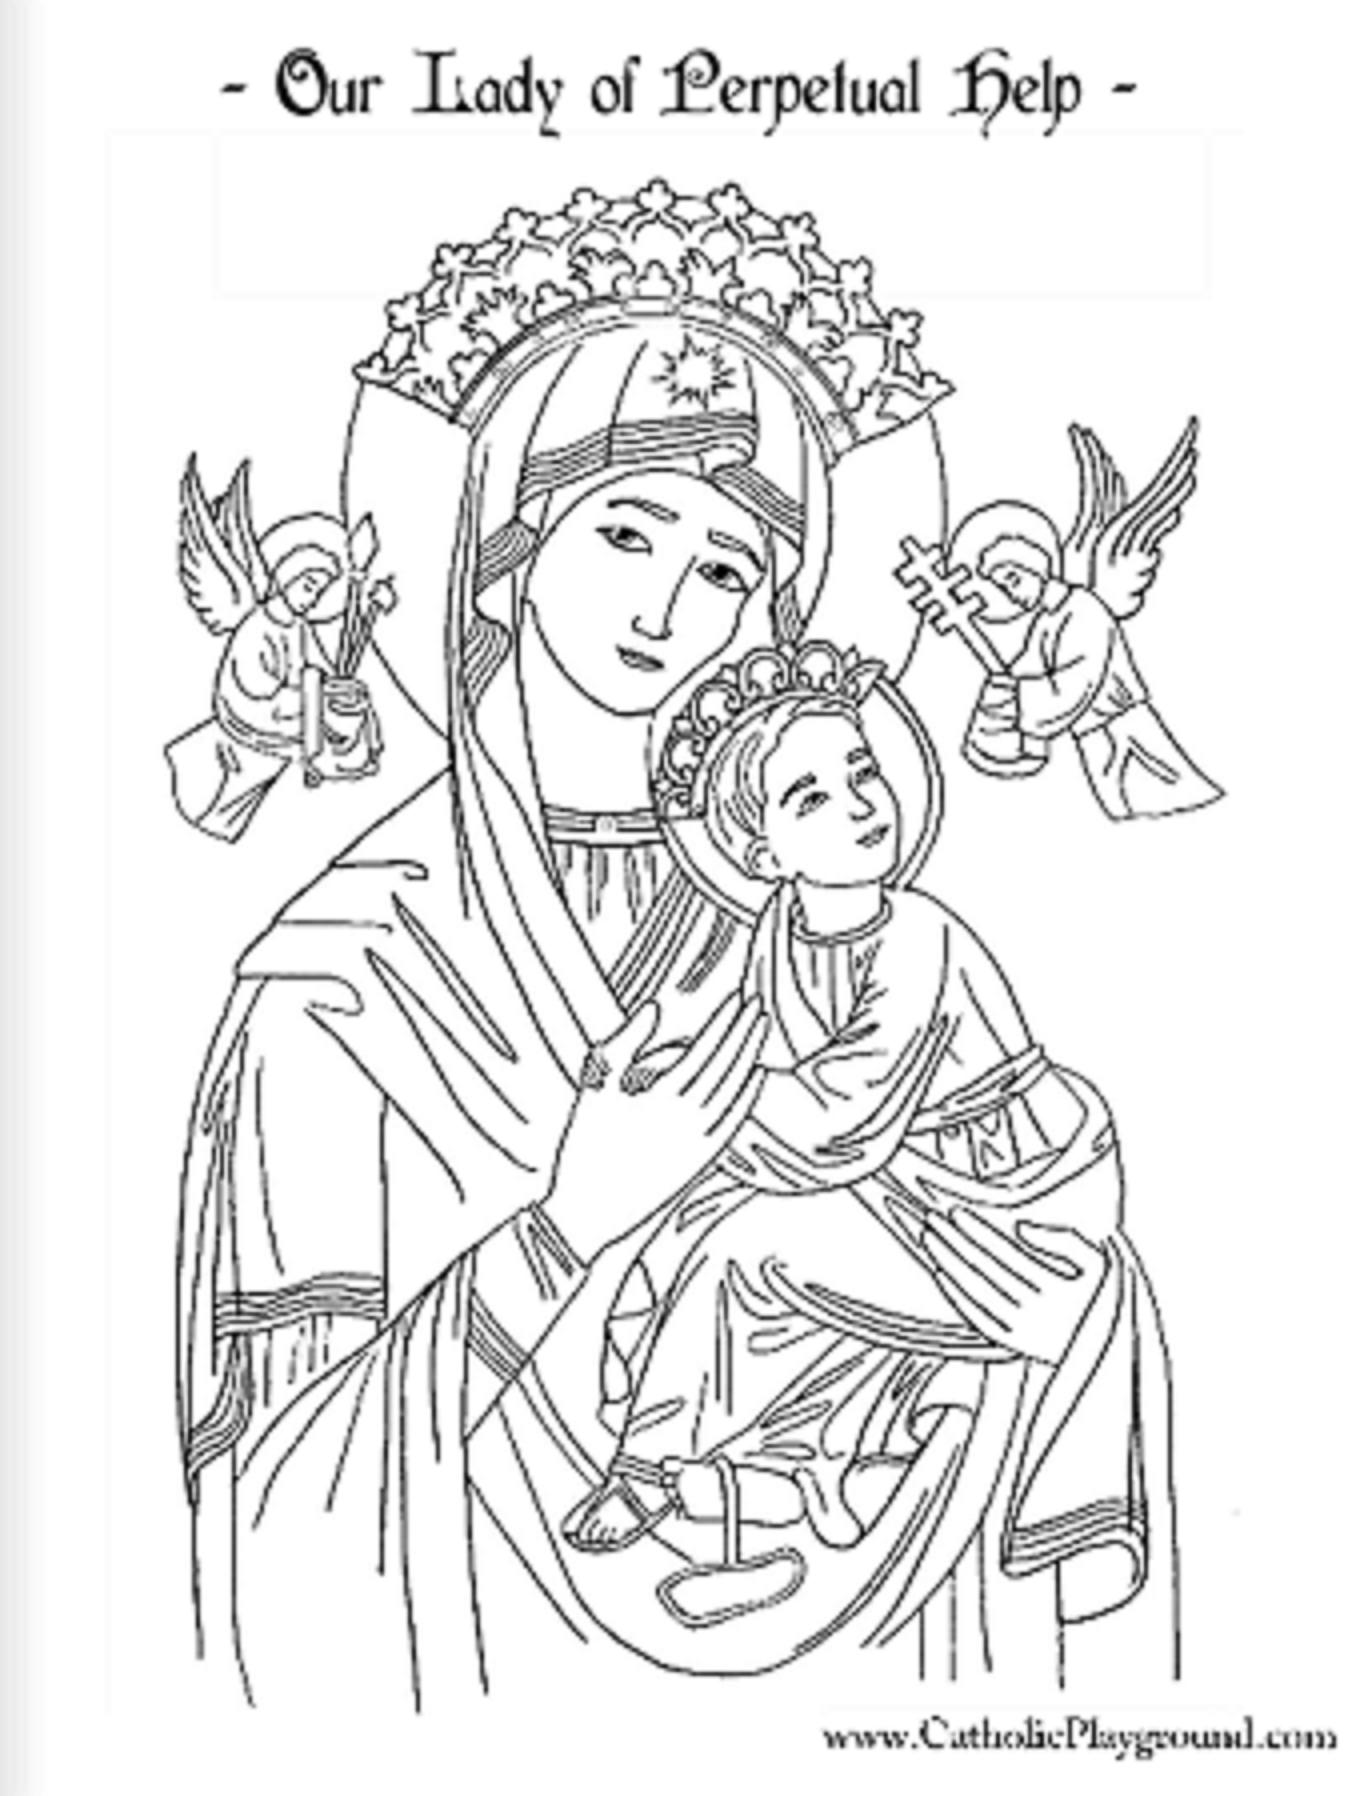 Pin De Romina Fretes Em Perpetuo Socorro Nuestra Senora Desenho Religioso Imagens Catolicas Arte Religiosa